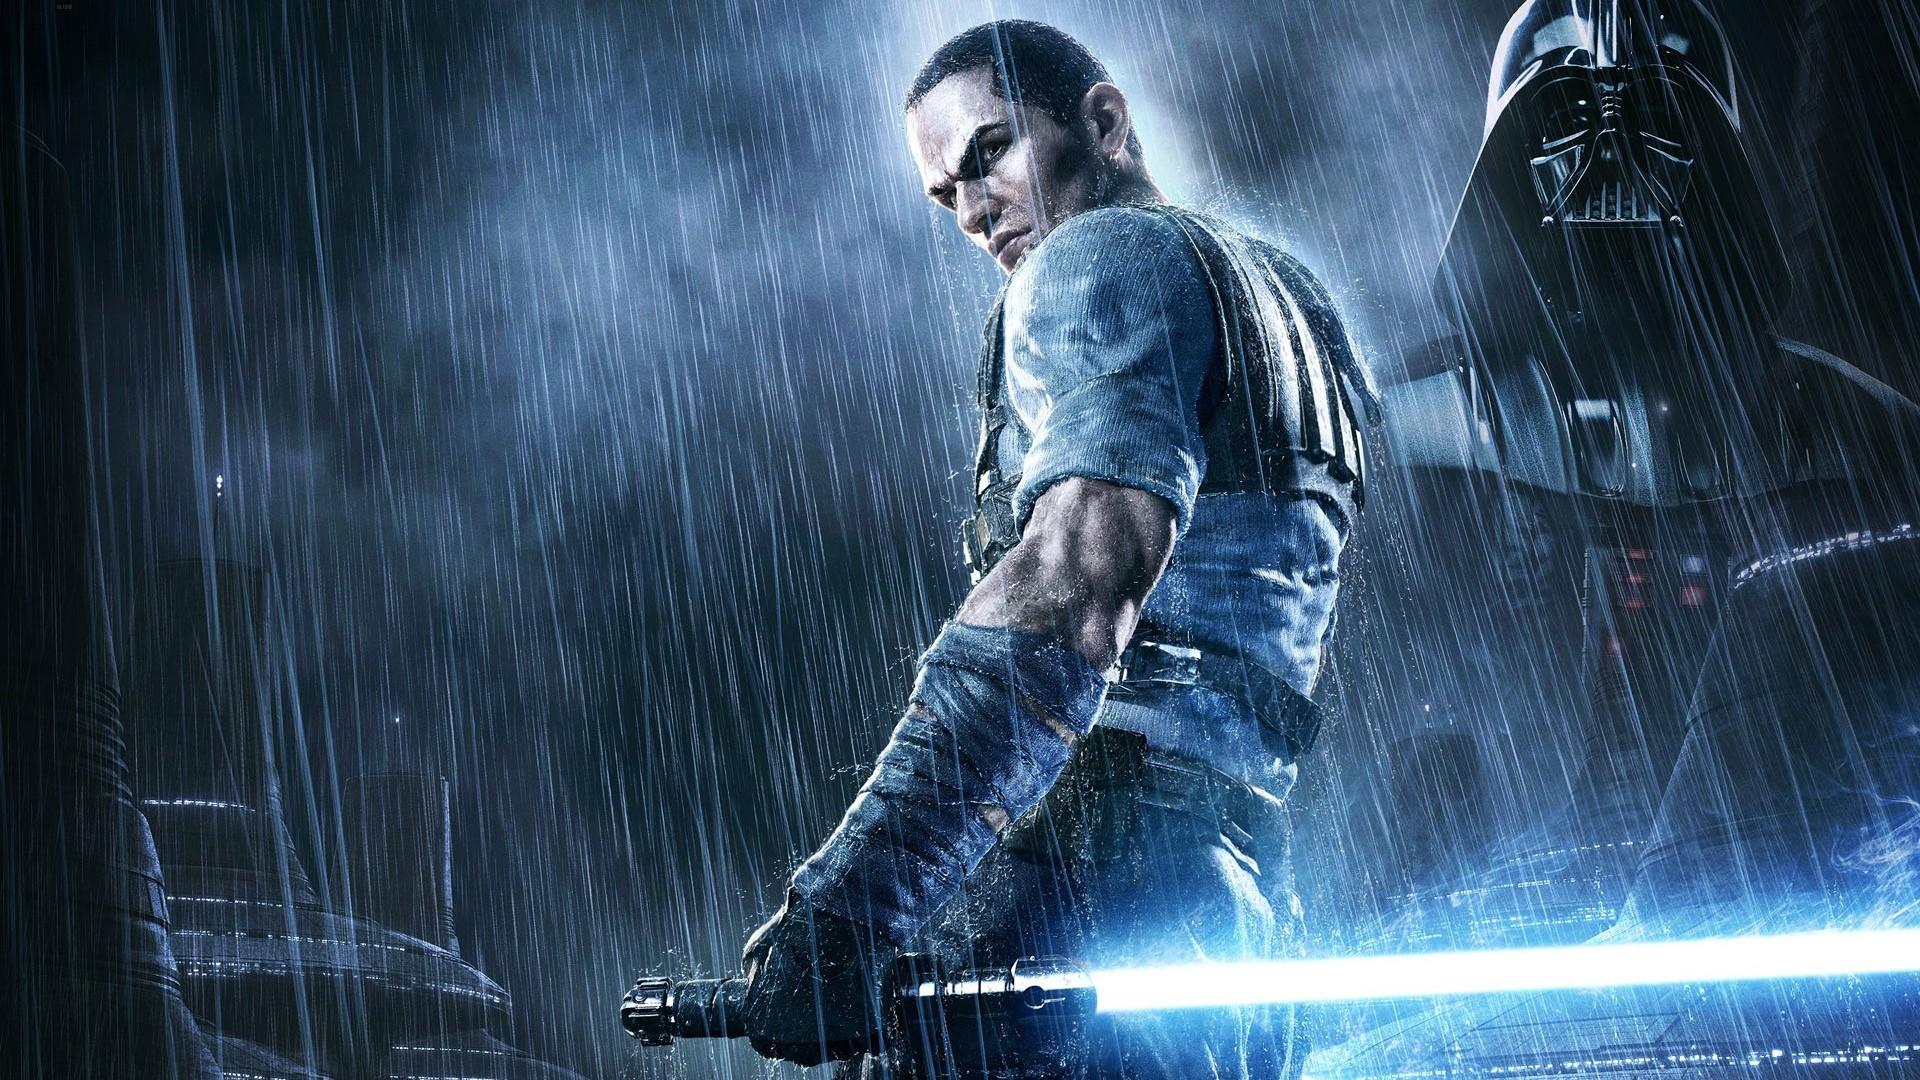 starkiller-and-darth-vader-in-star-wars-1080p-game-desktop-wallpaper-24185.jpg